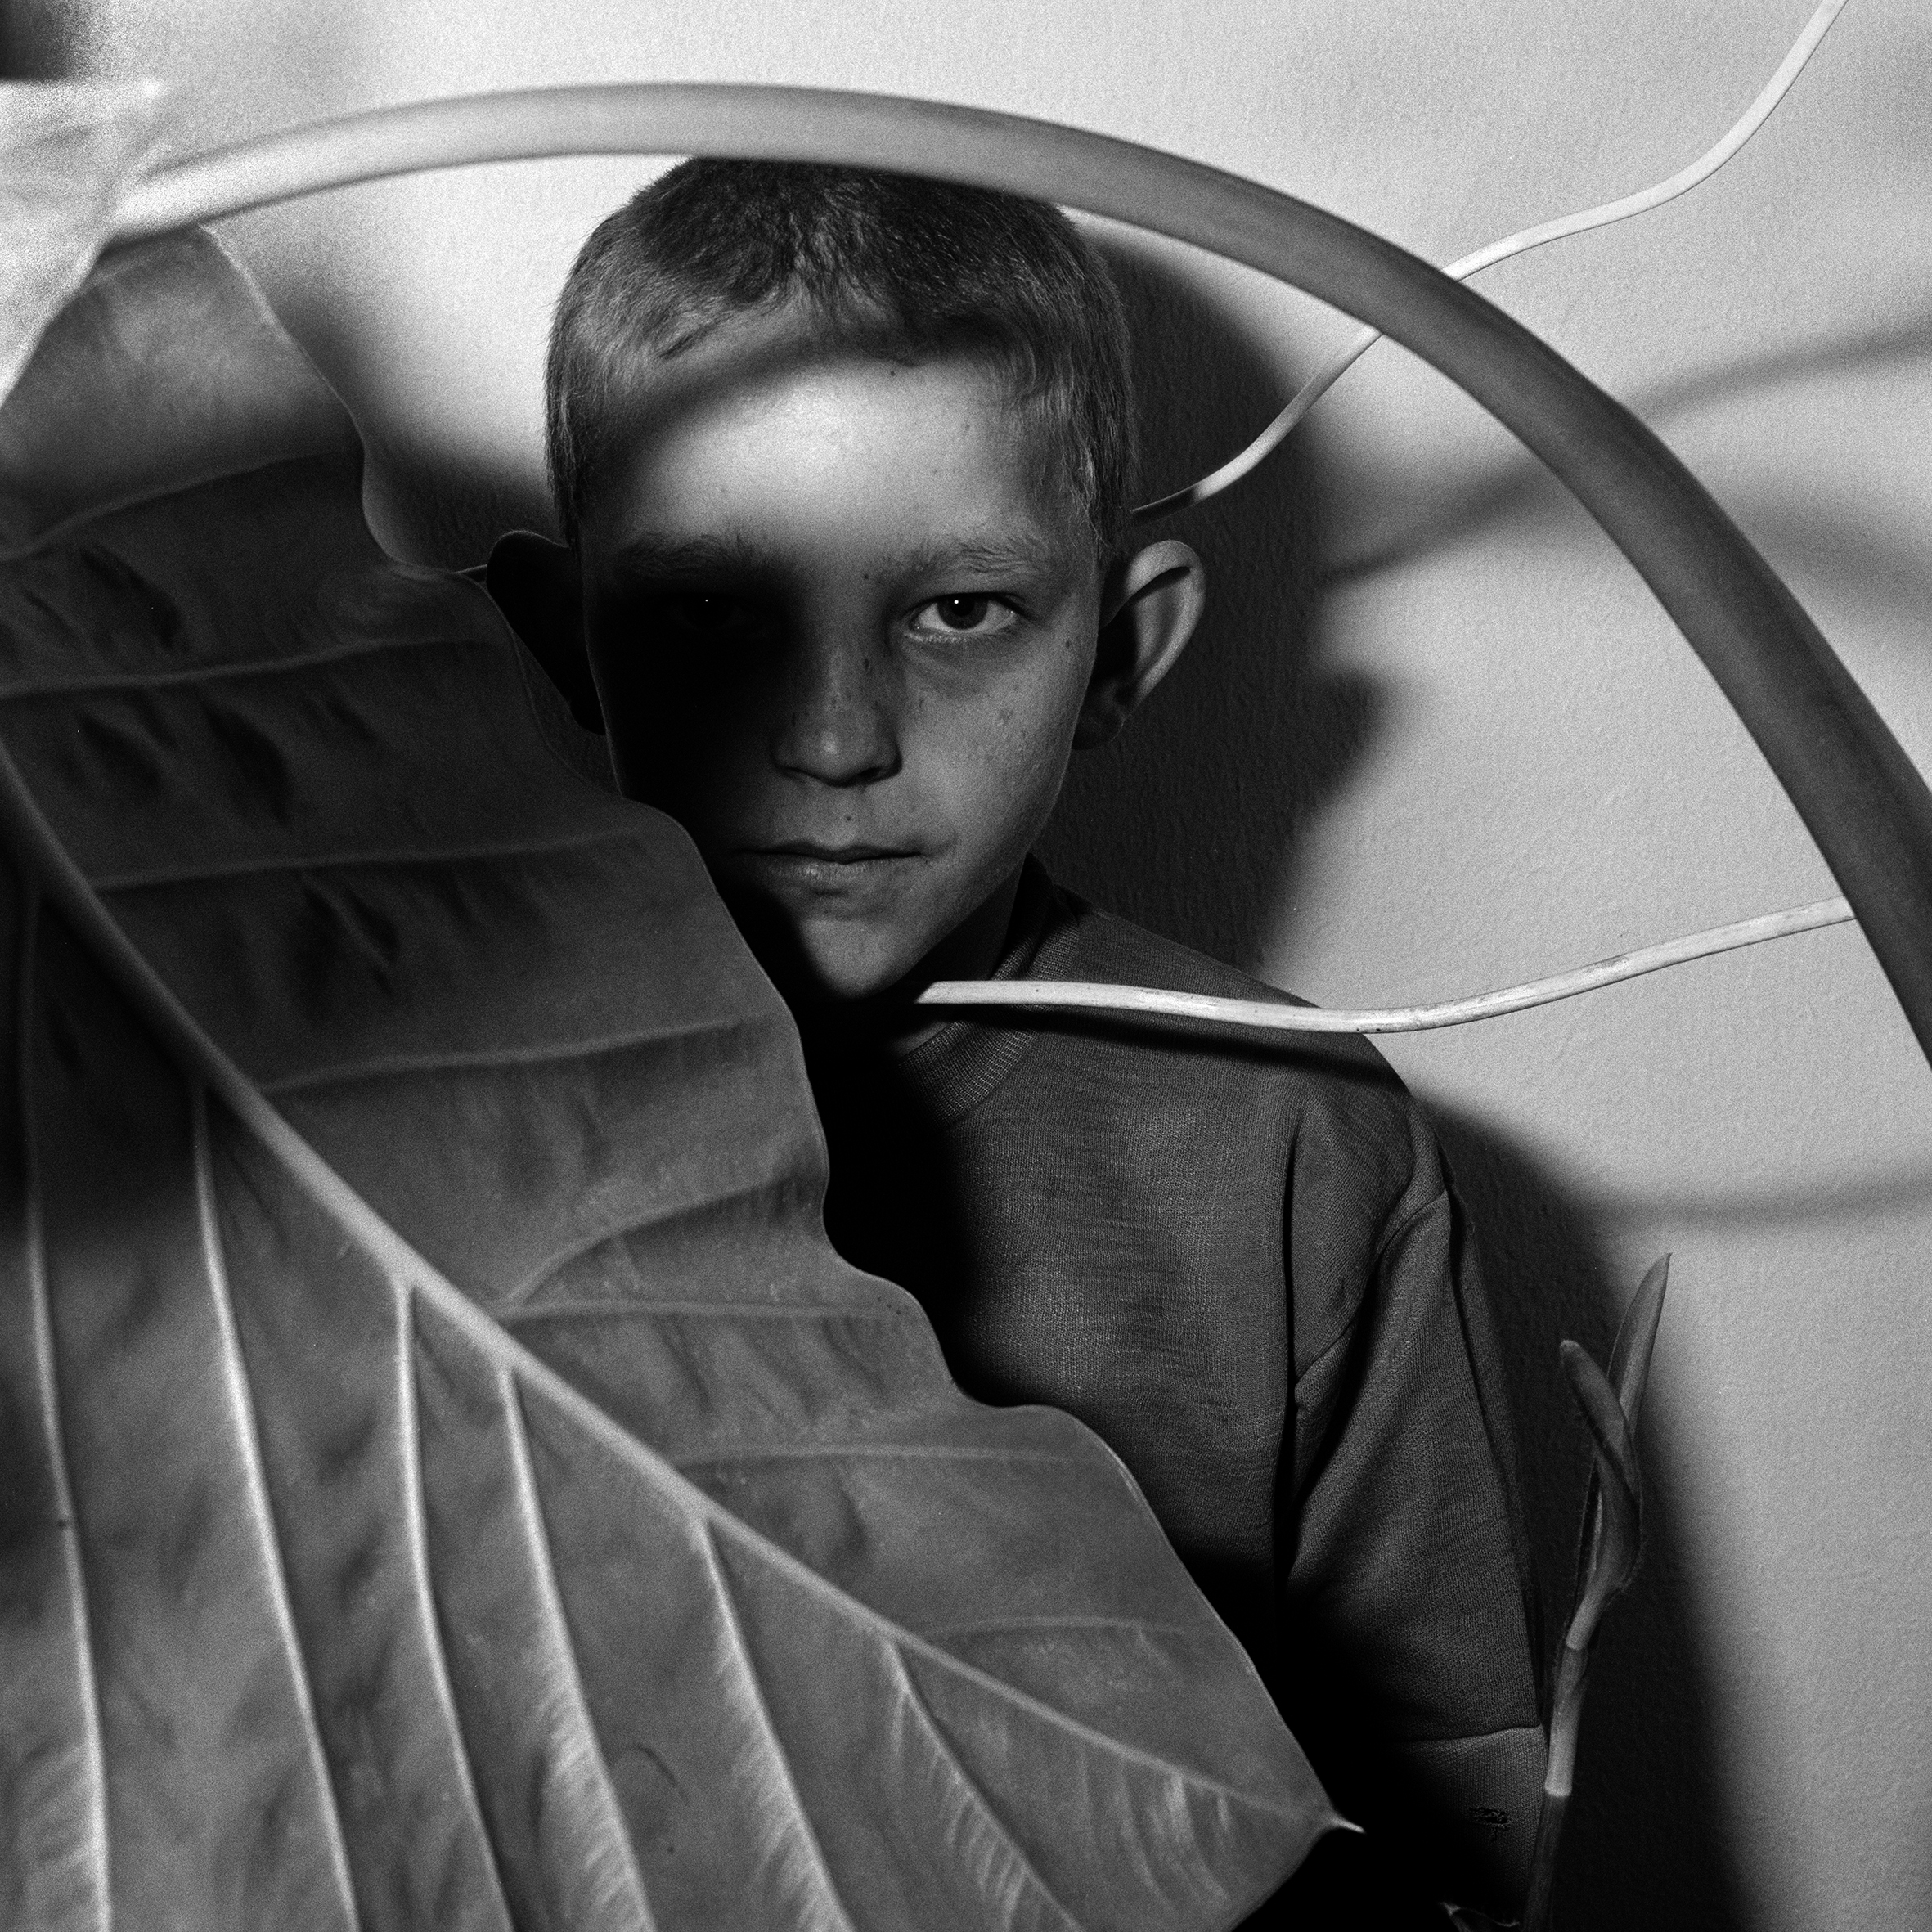 Roger Ballen_Study of Boy and Plant, 1999_camara oscura.jpg